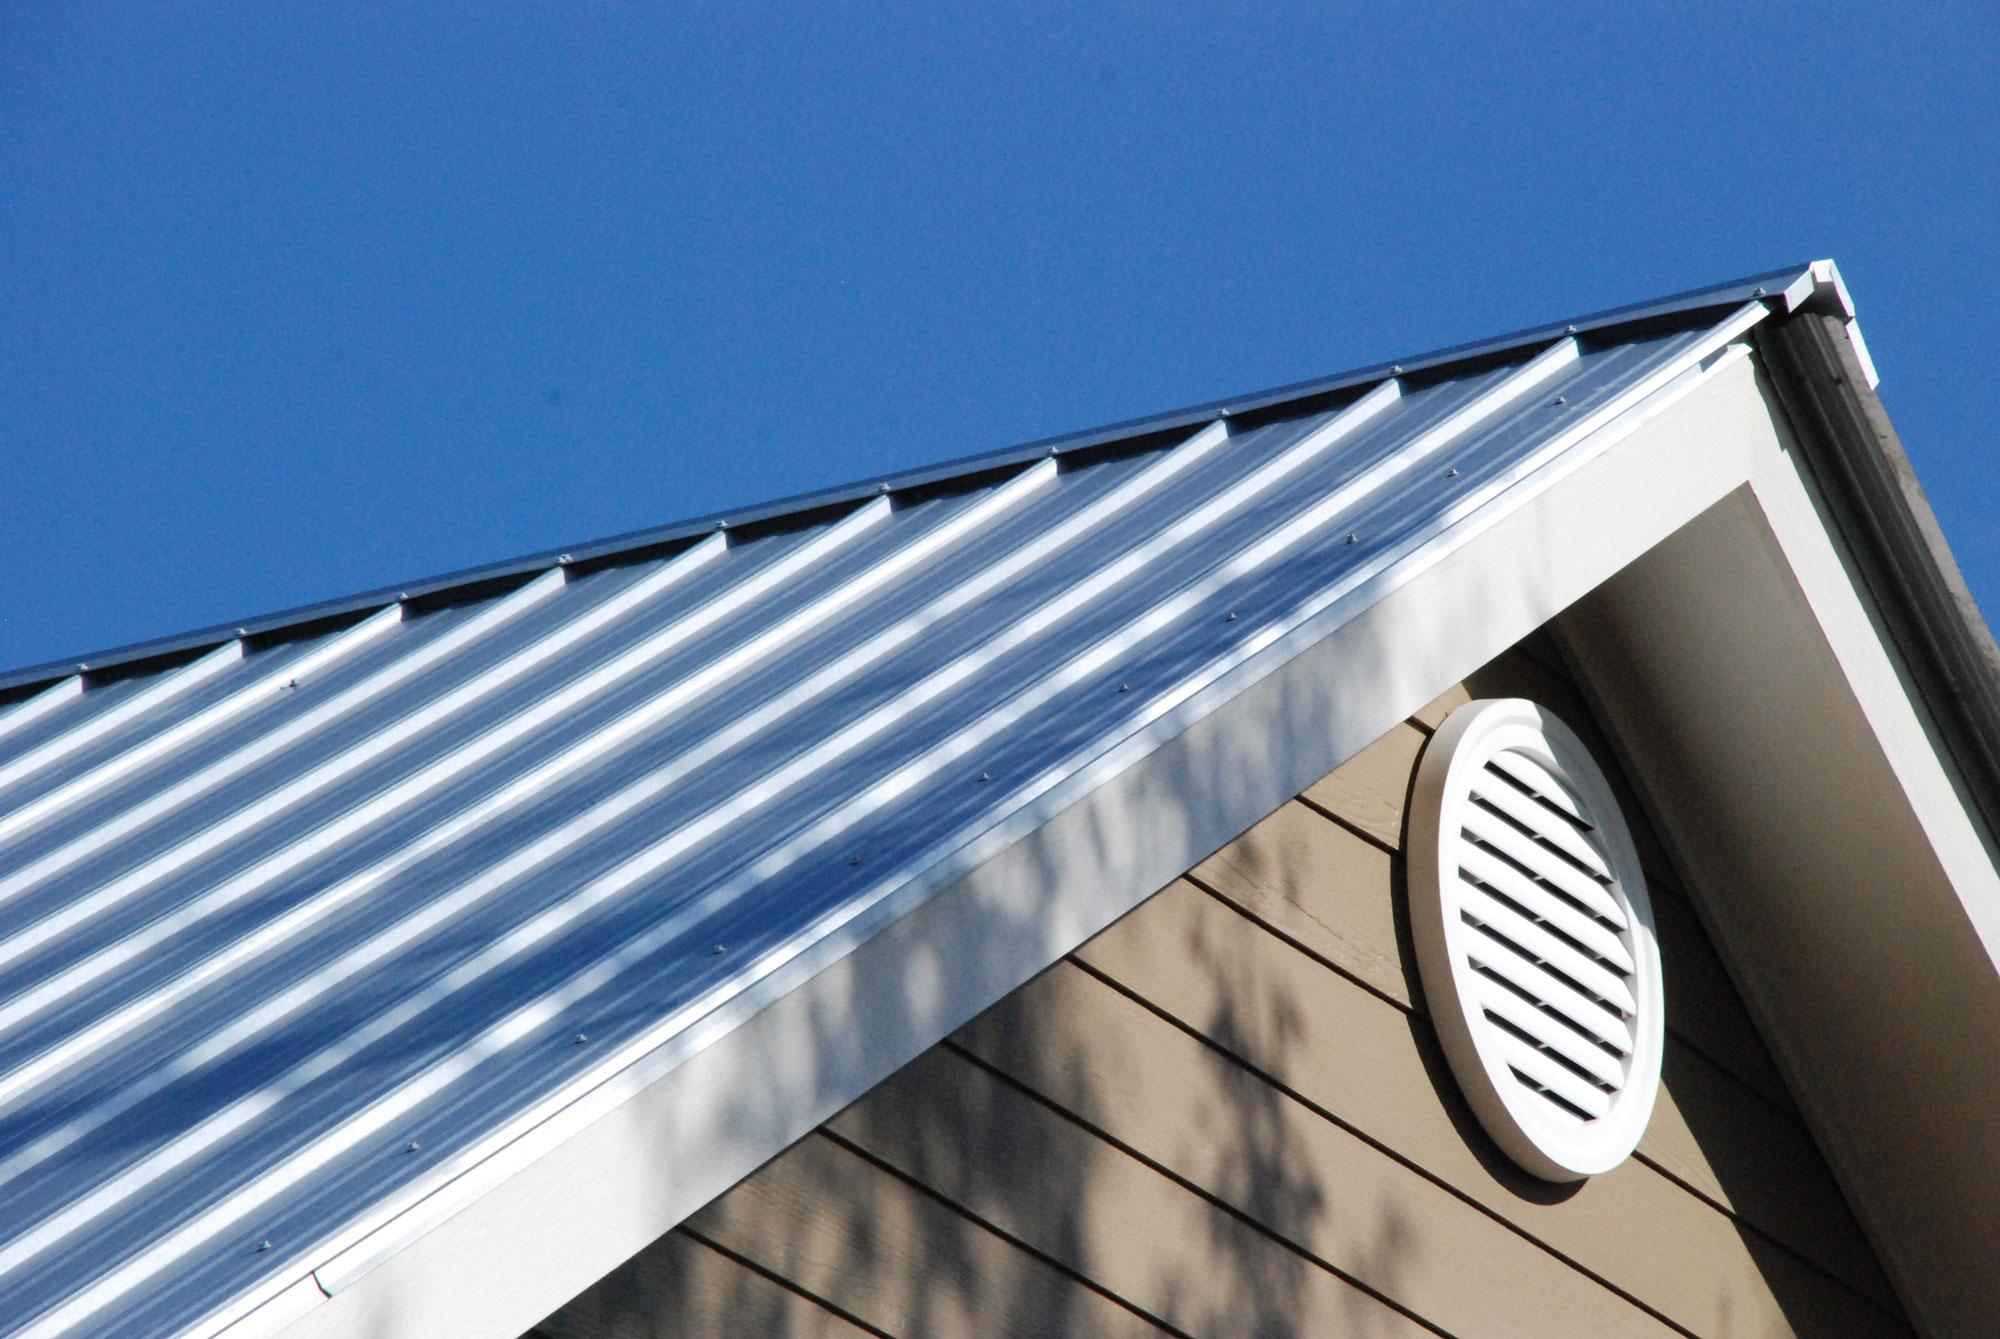 Bay Waveland Habitat Home Leeds Mississippi With Platinum